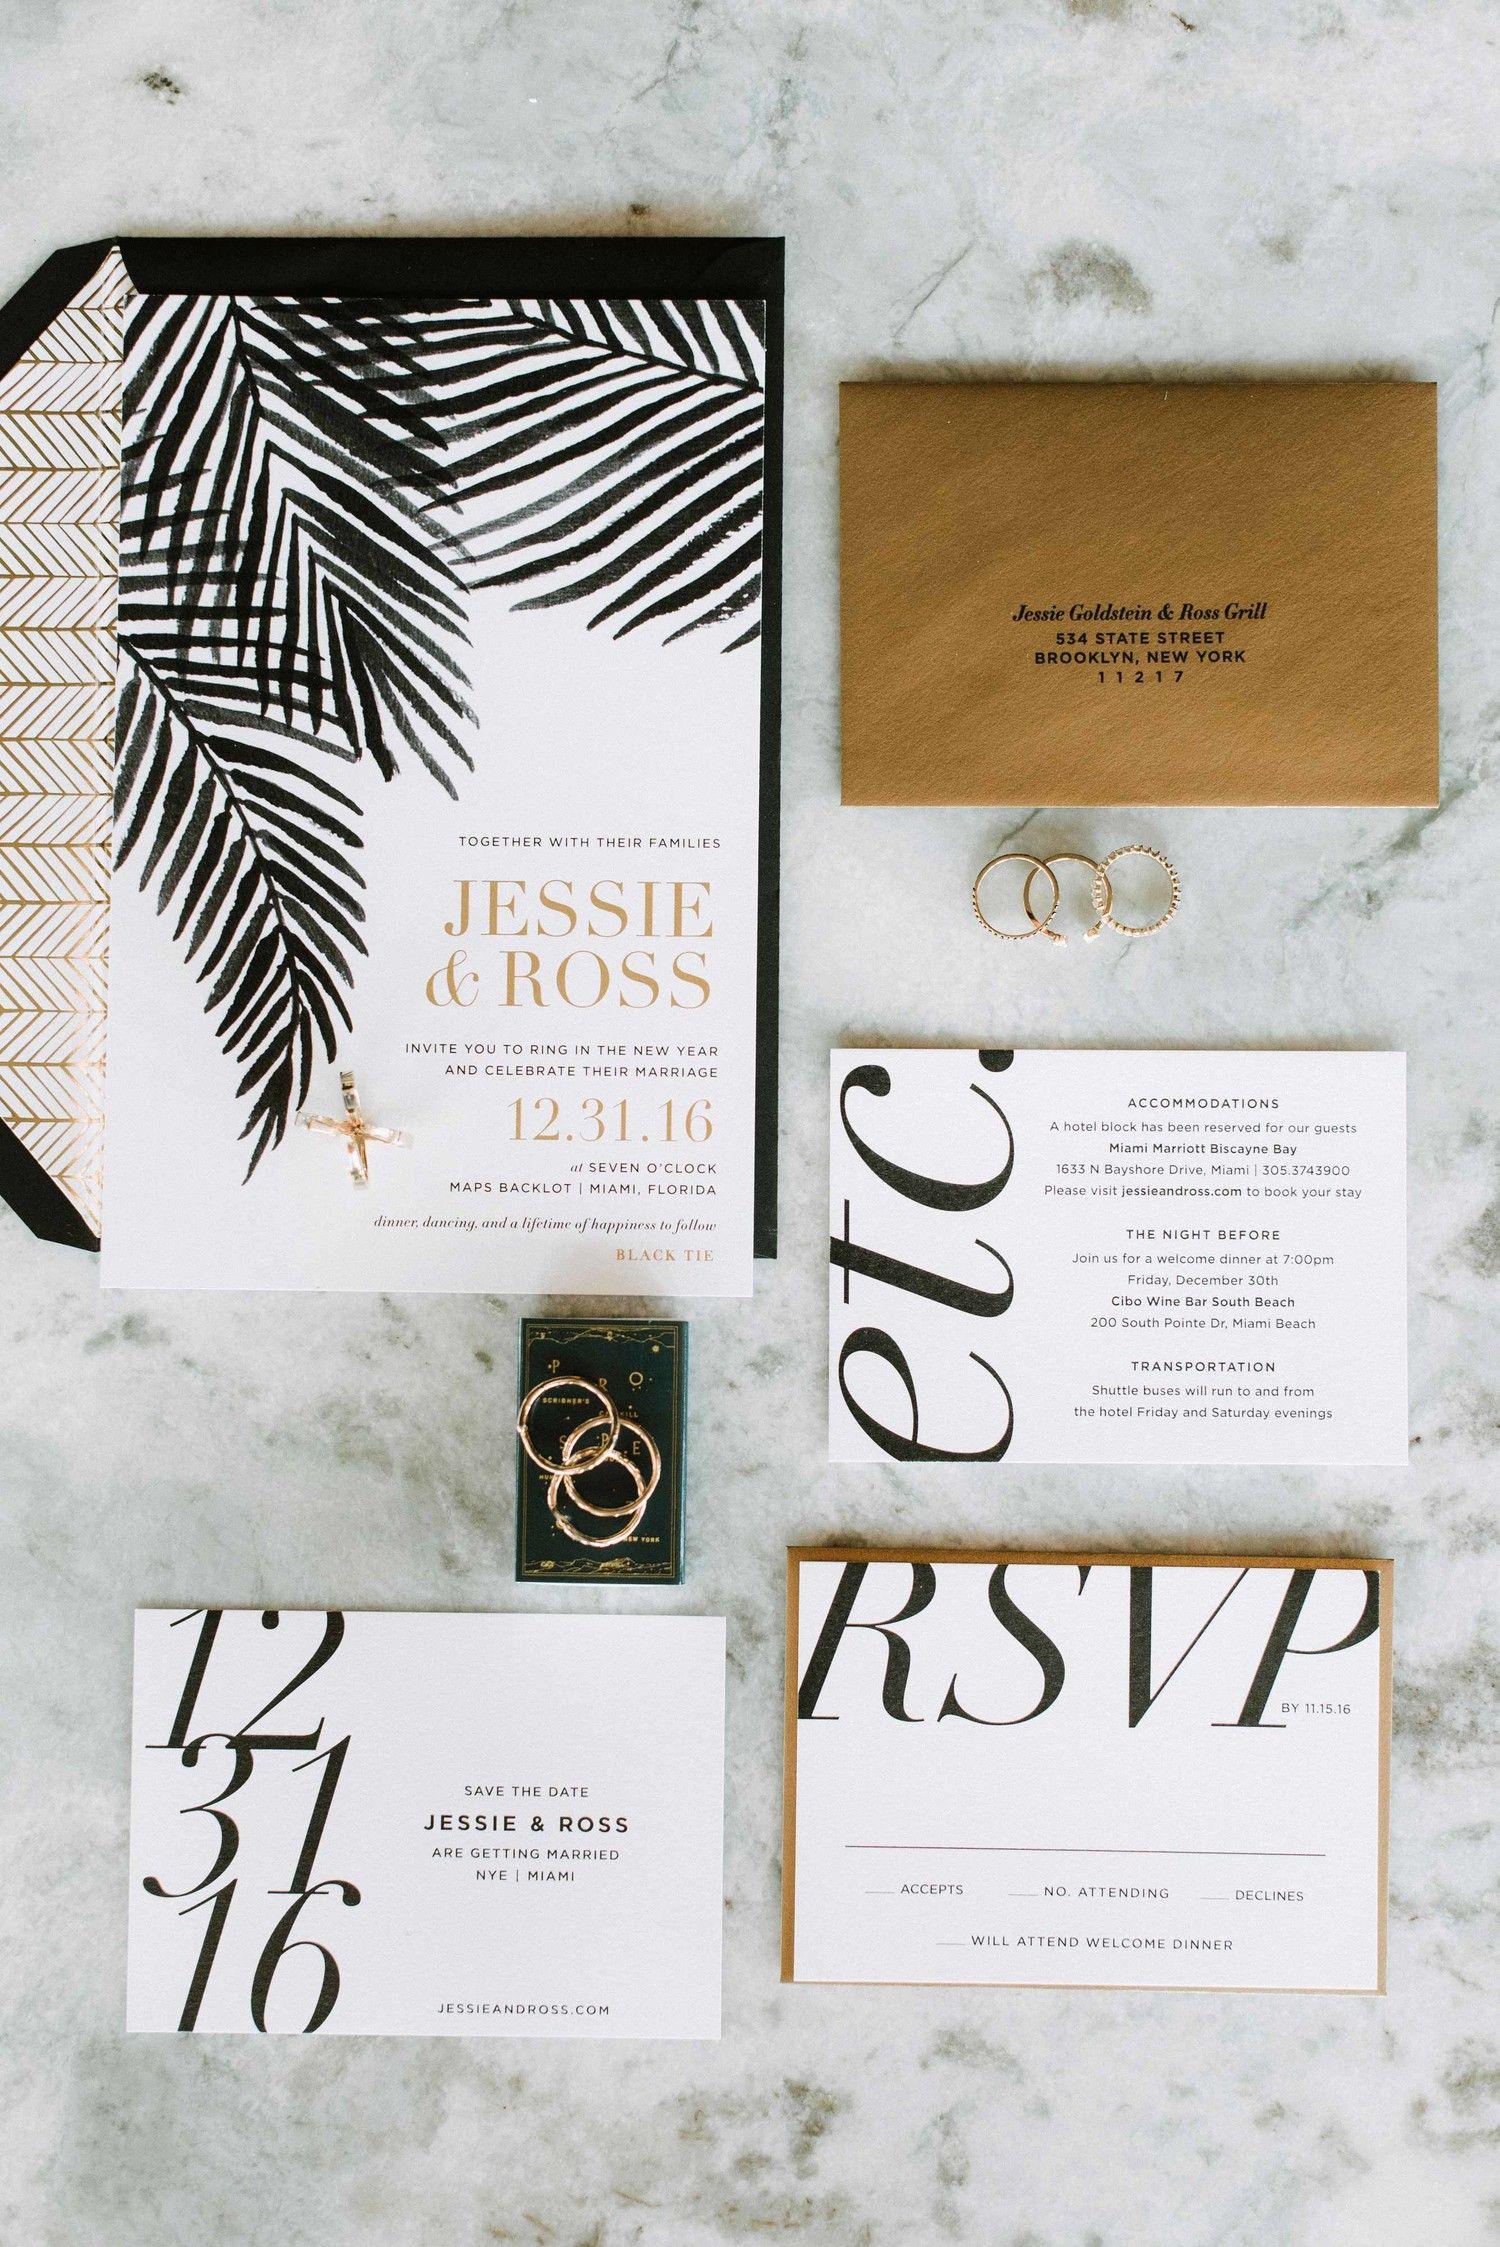 30 Modern Wedding Invitations We Love Wedding Guest List Etiquette Modern Wedding Invitations Wedding Invitation Enclosures